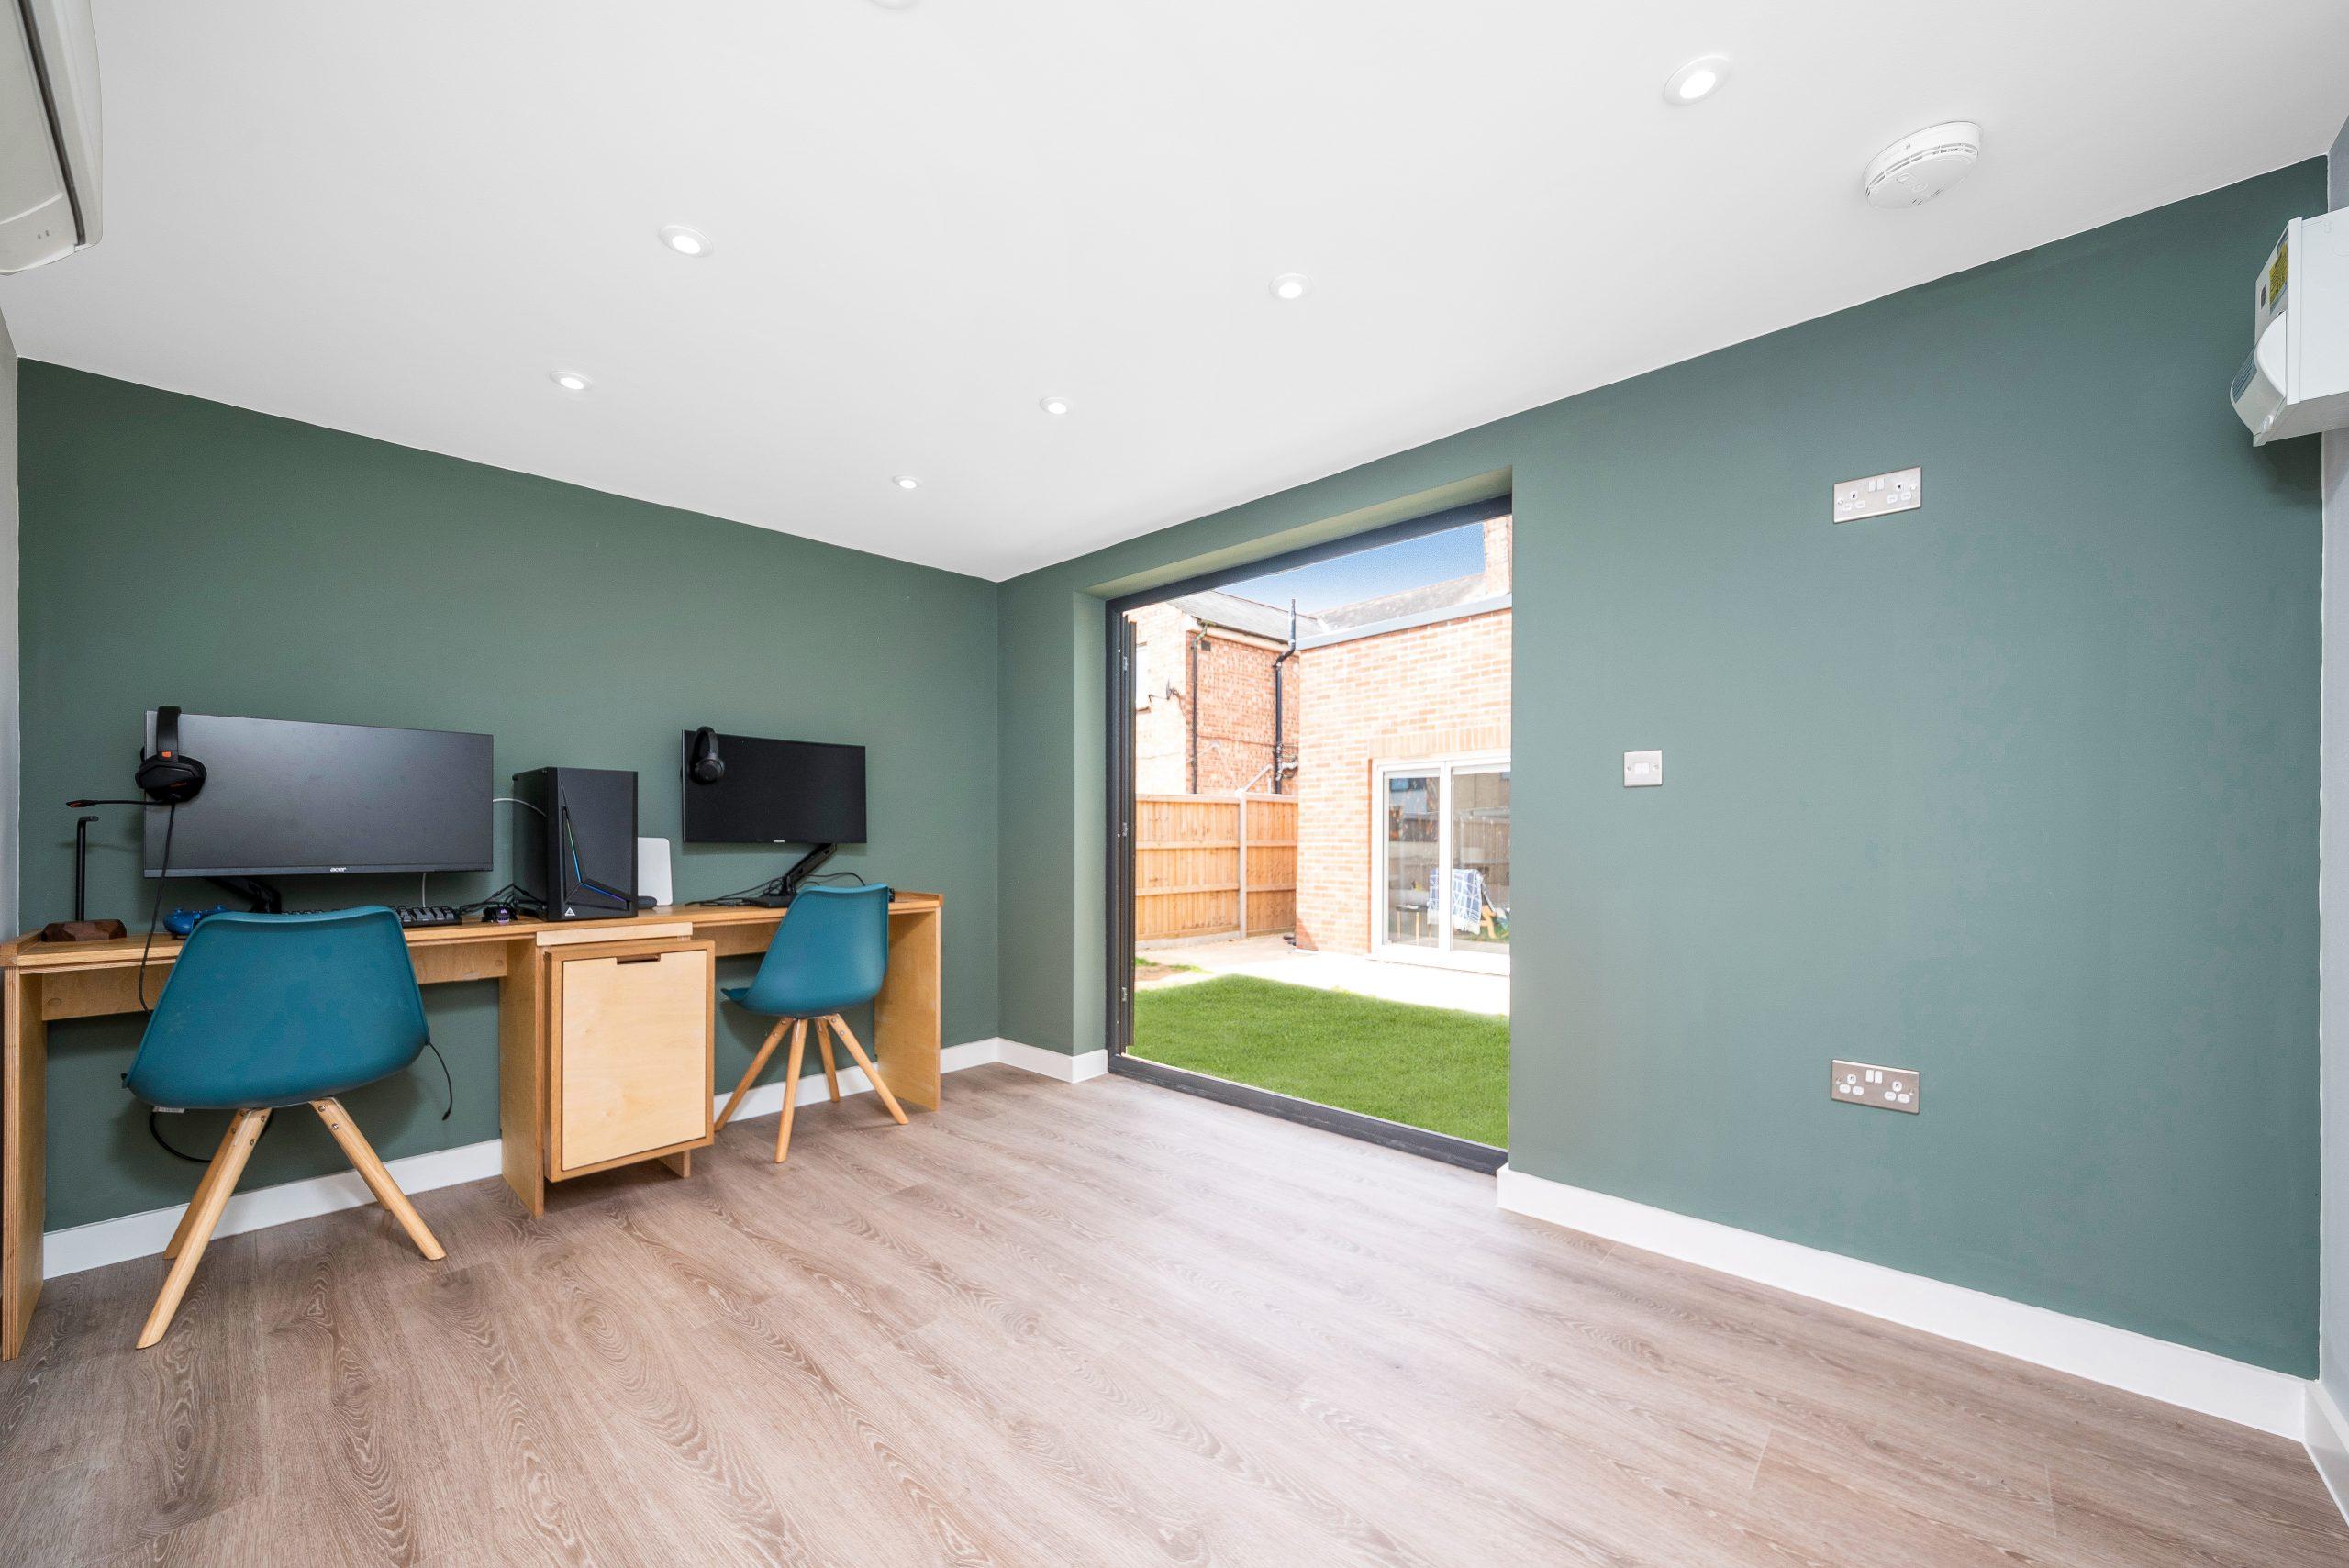 Modern garden rooms for office work